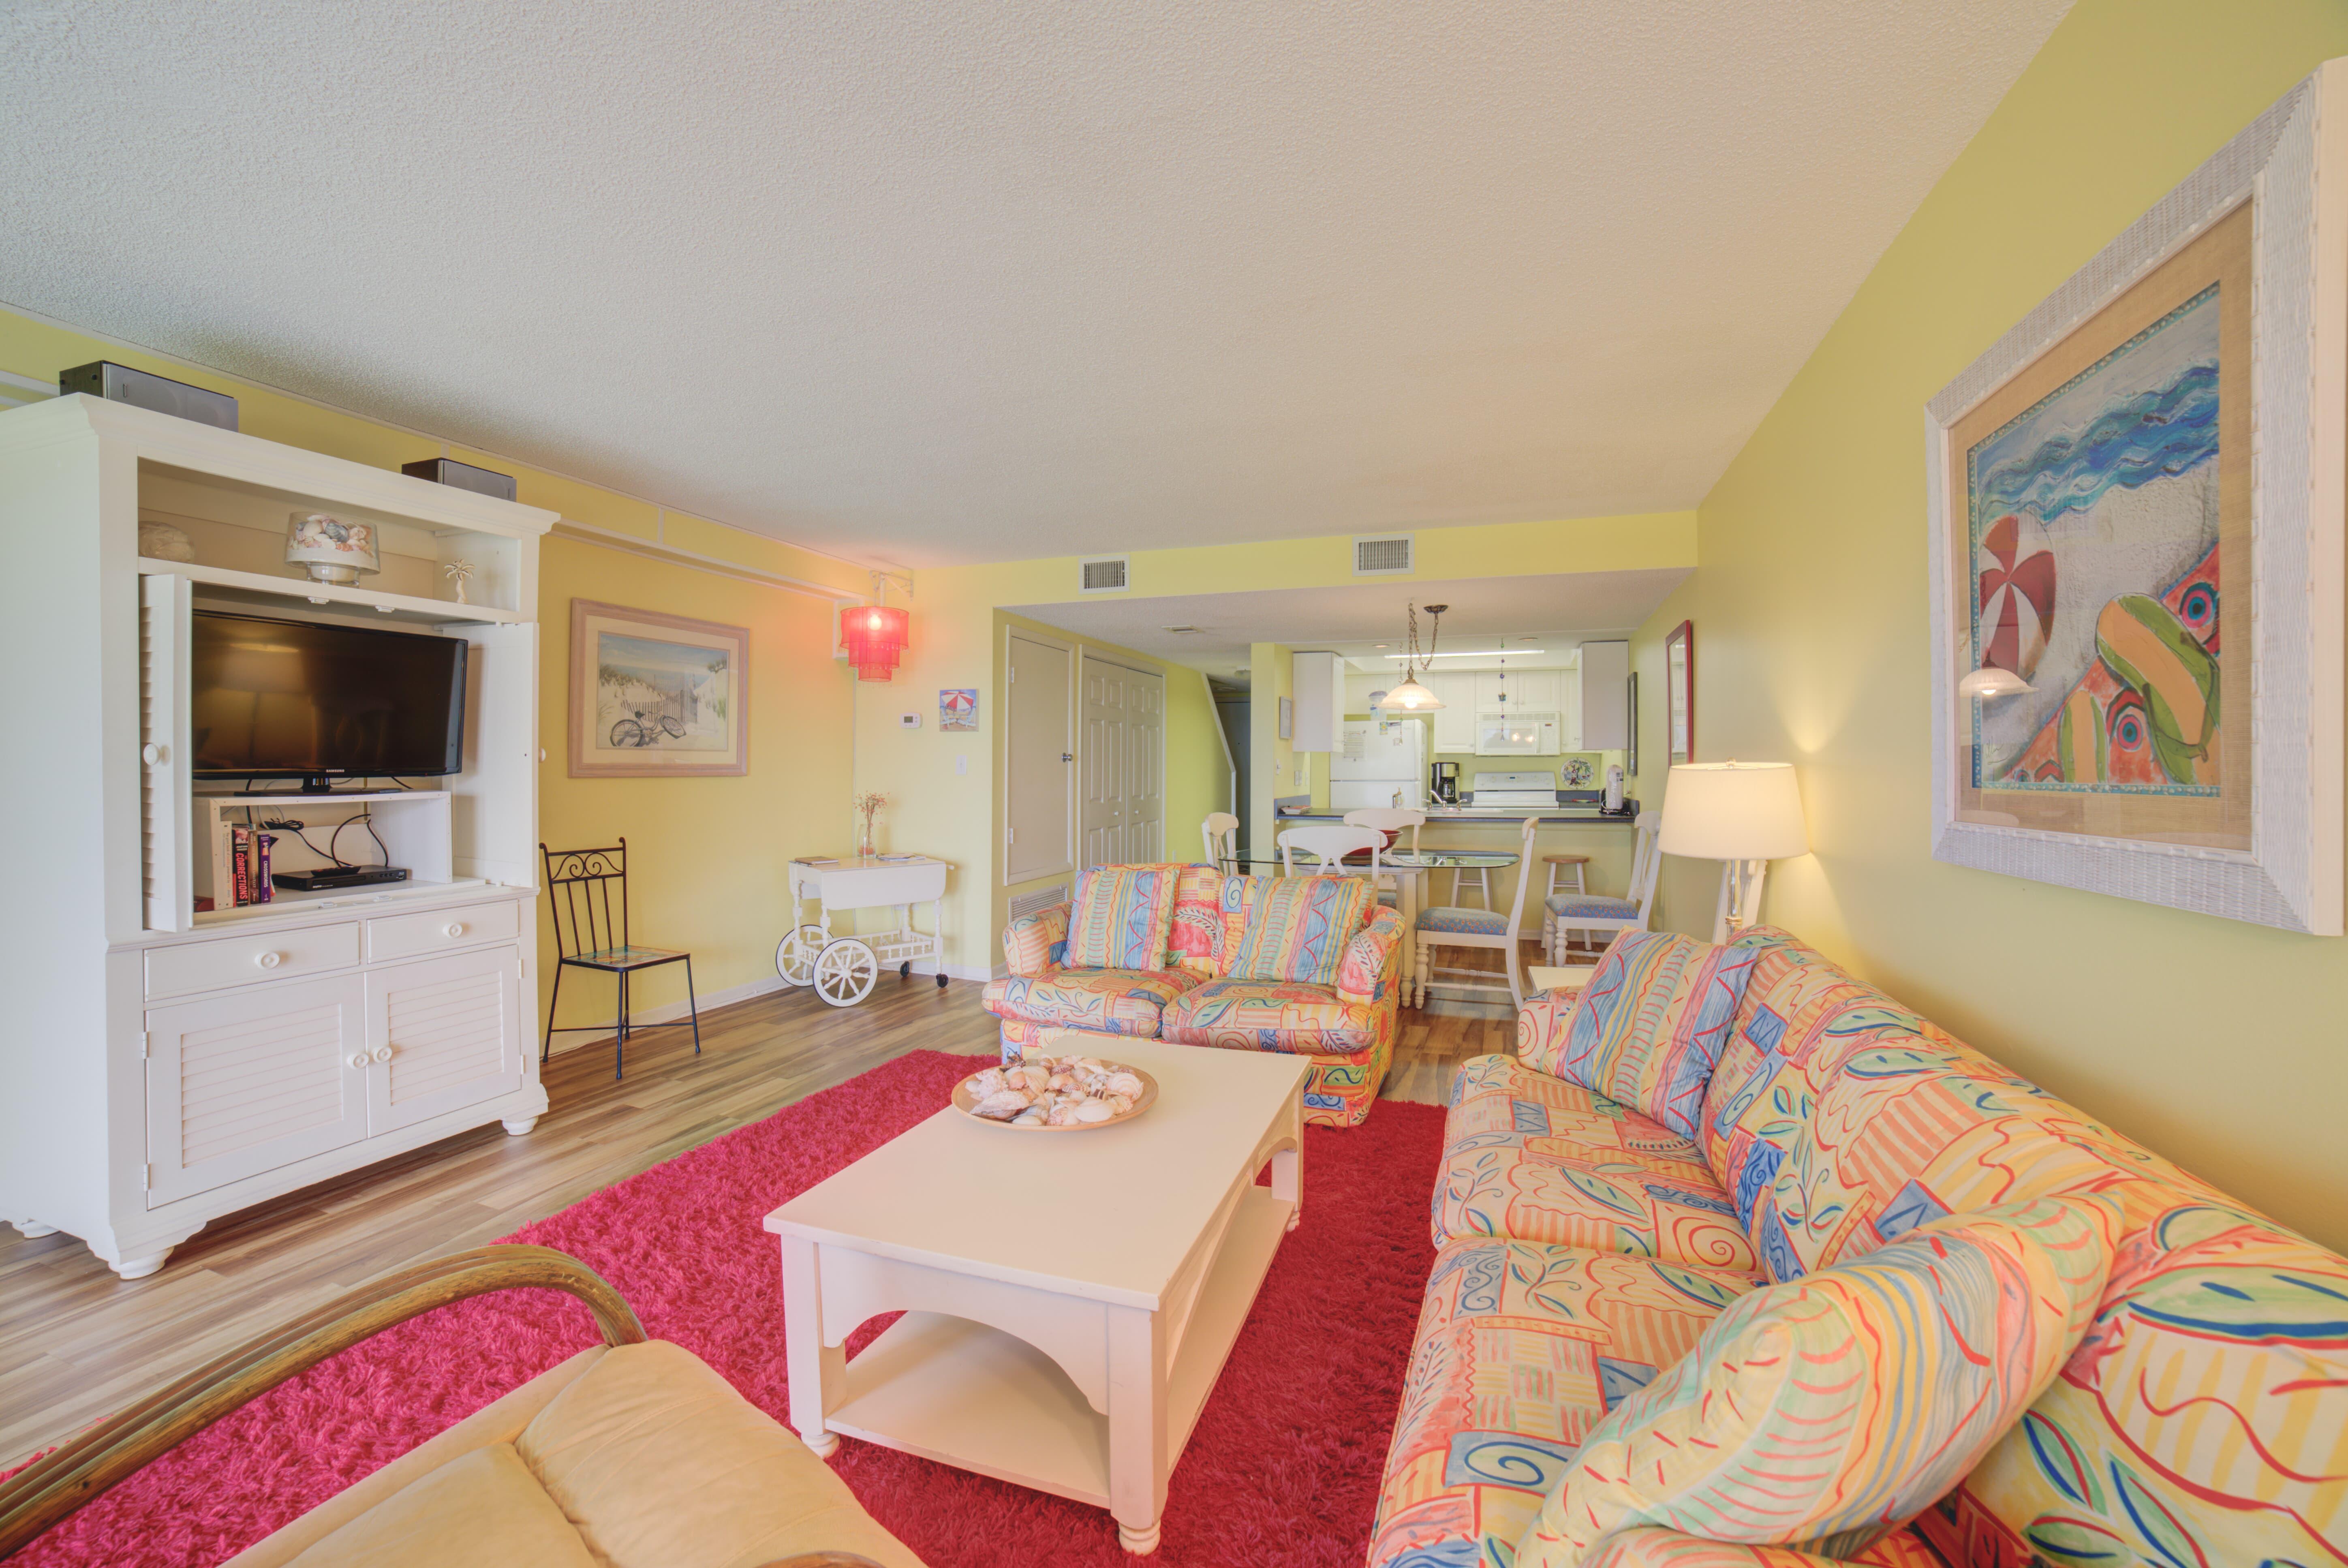 Santa Rosa Dunes #824 Condo rental in Santa Rosa Dunes in Pensacola Beach Florida - #9